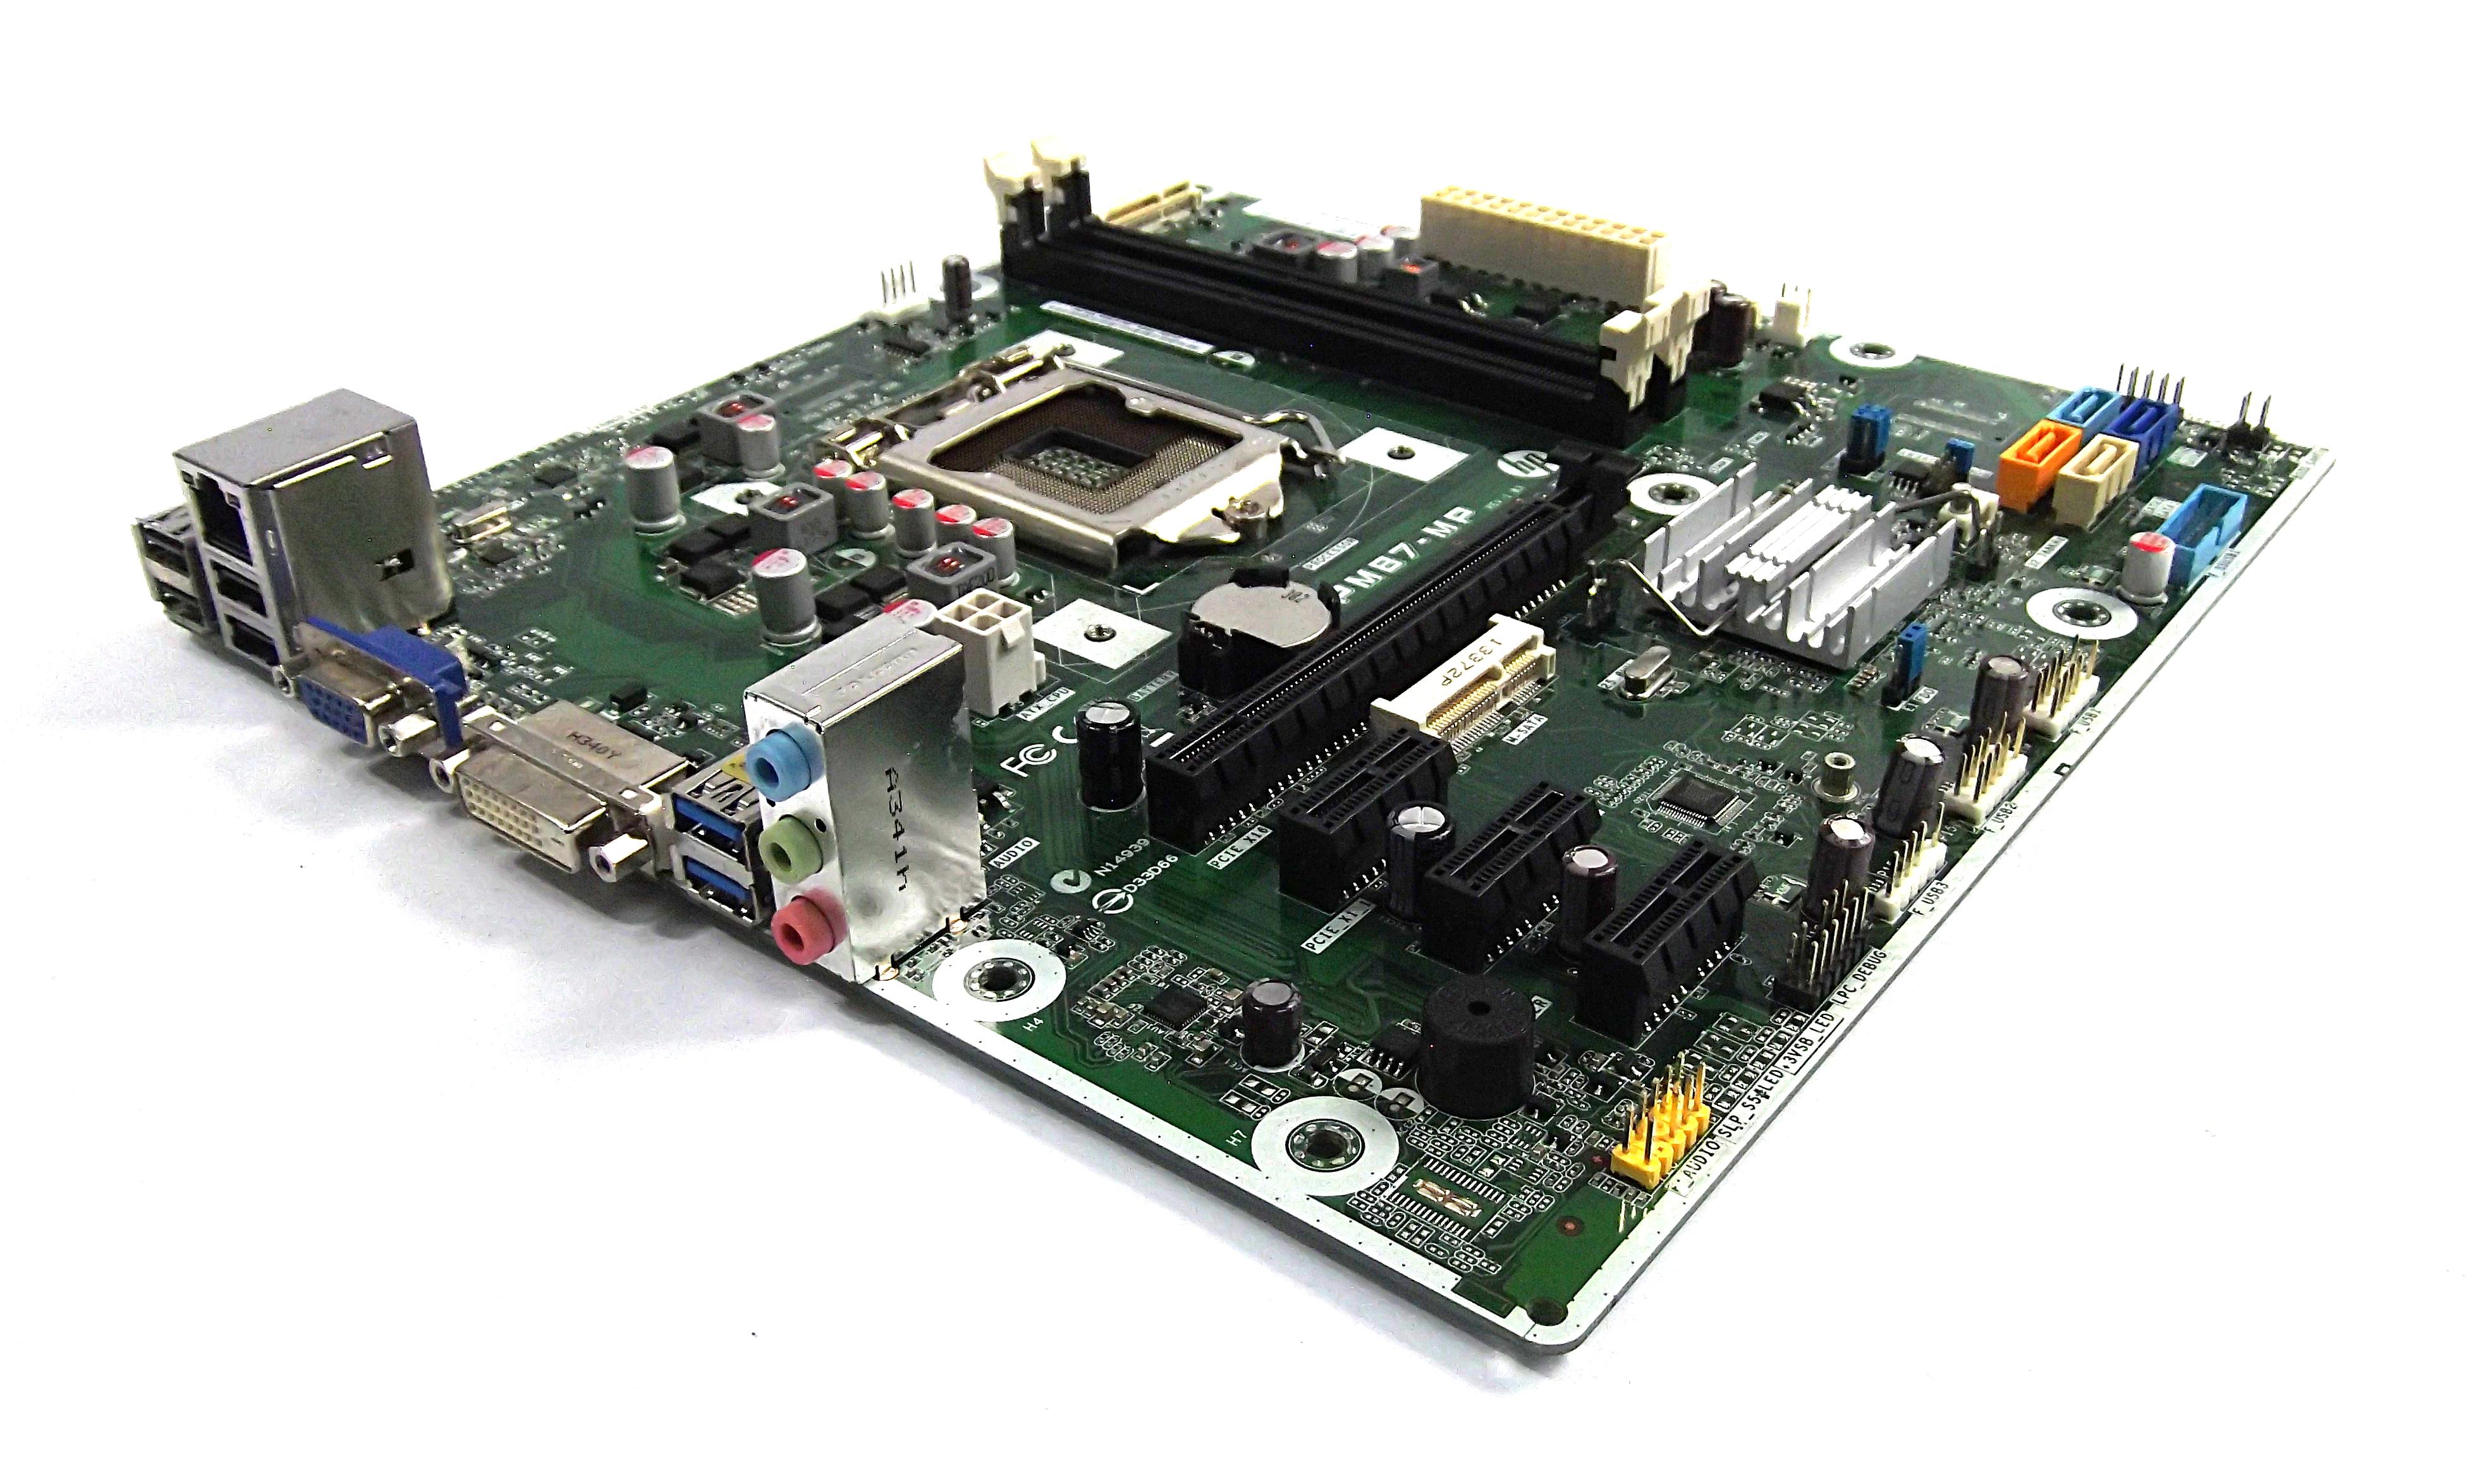 HP 707825-001 Pavilion 500 PC Socket LGA1150 Motherboard - IPM87-MP REV:1.04